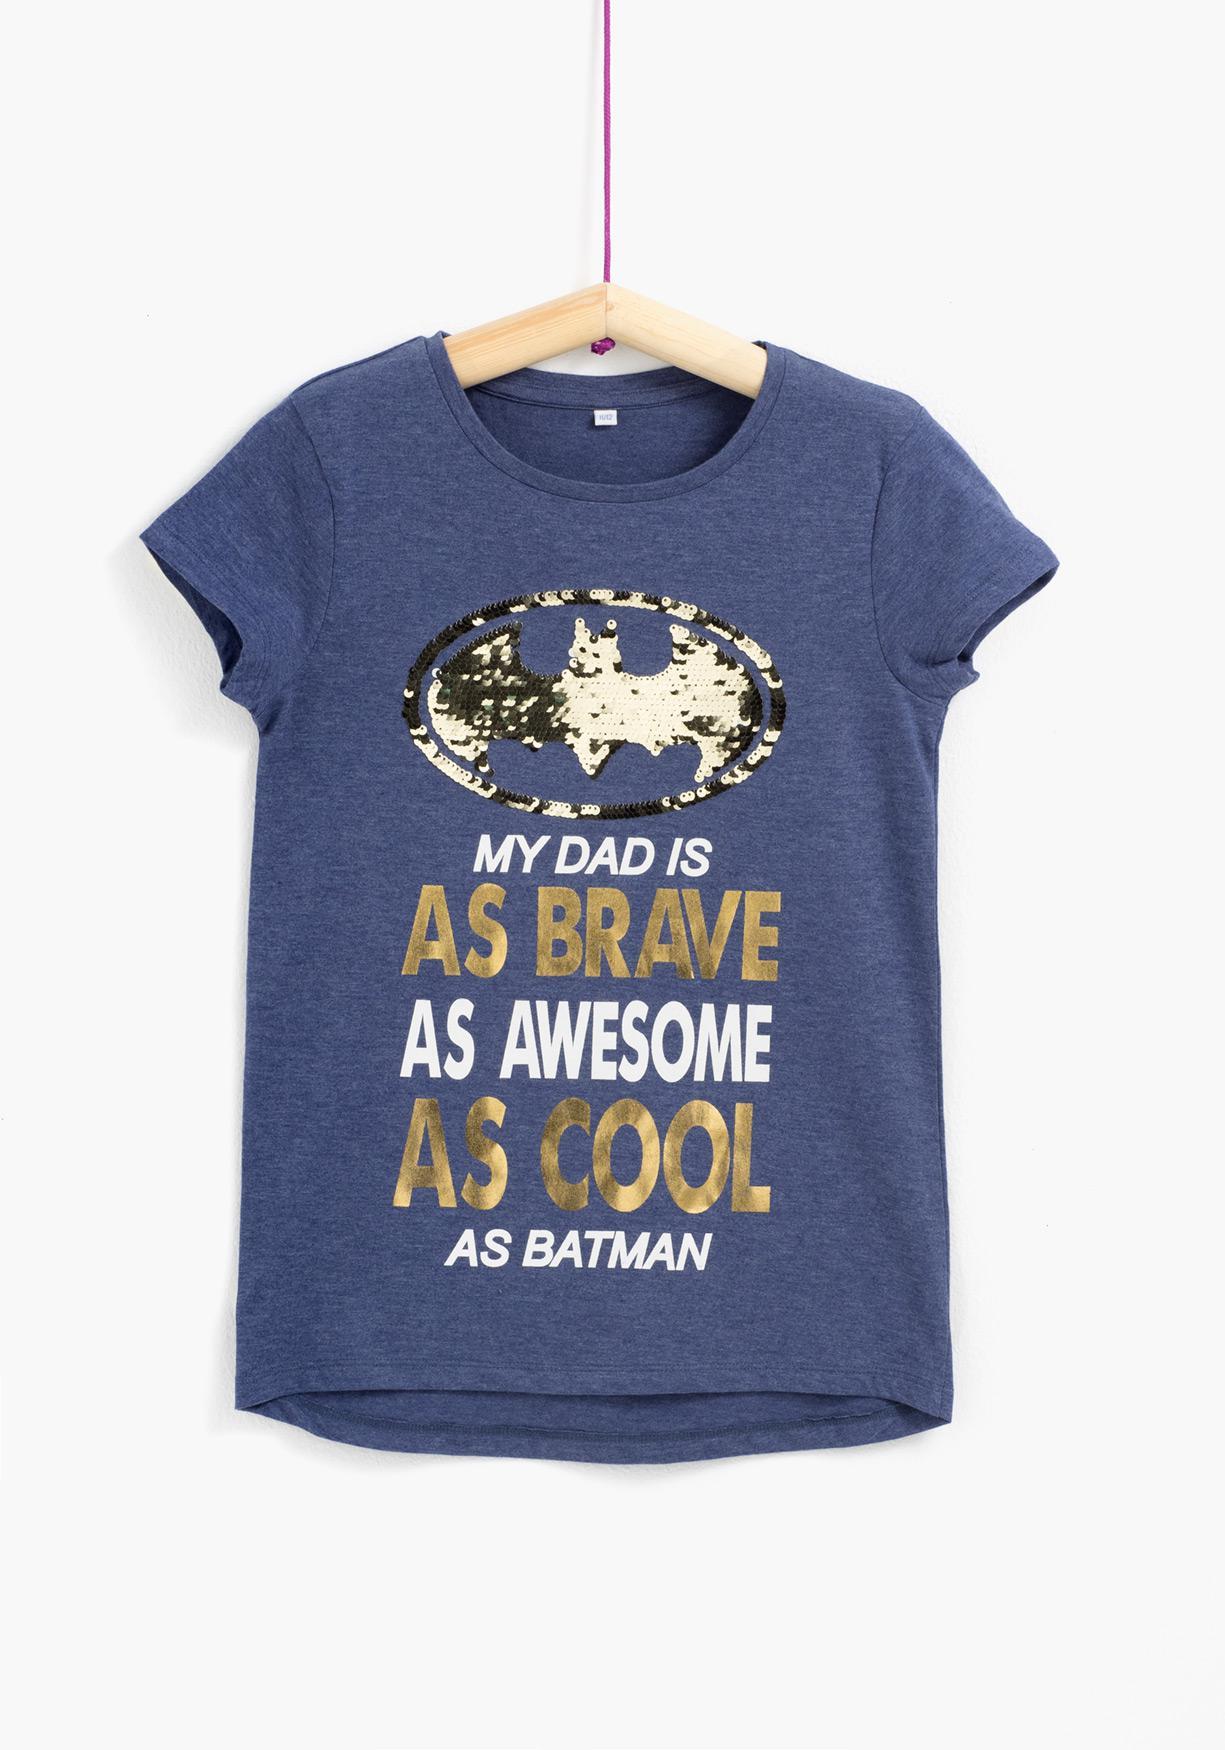 ea327a27e Comprar Camiseta lentejuelas reversibles WARNER. ¡Aprovéchate de ...